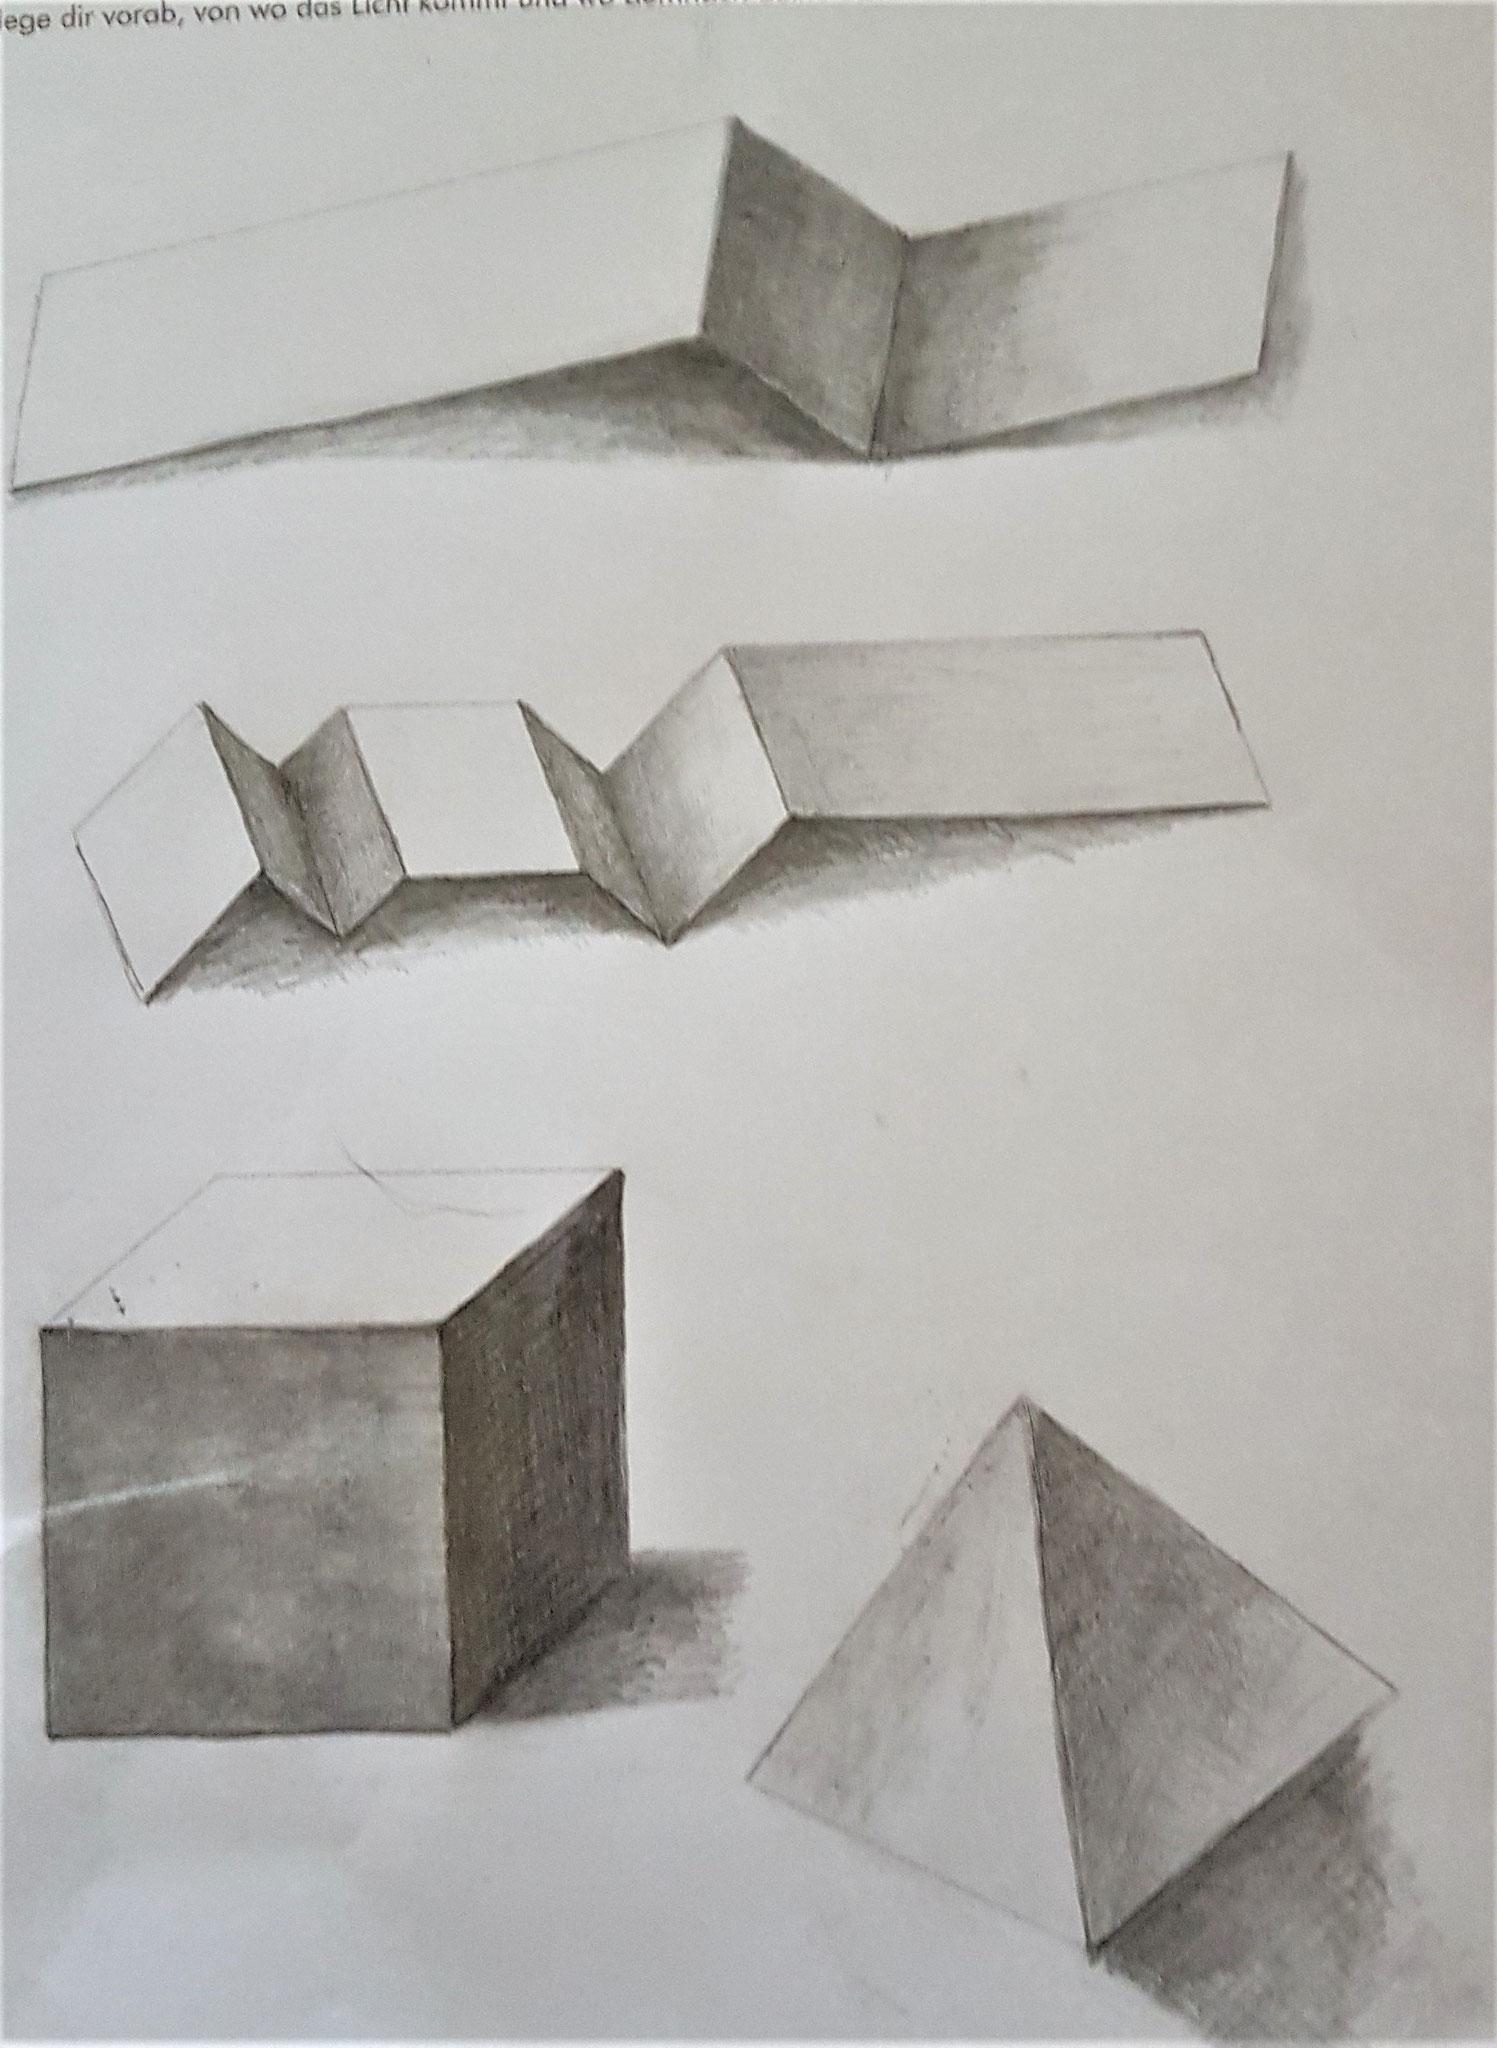 Petra Althof-Heumann / Objekte schattieren